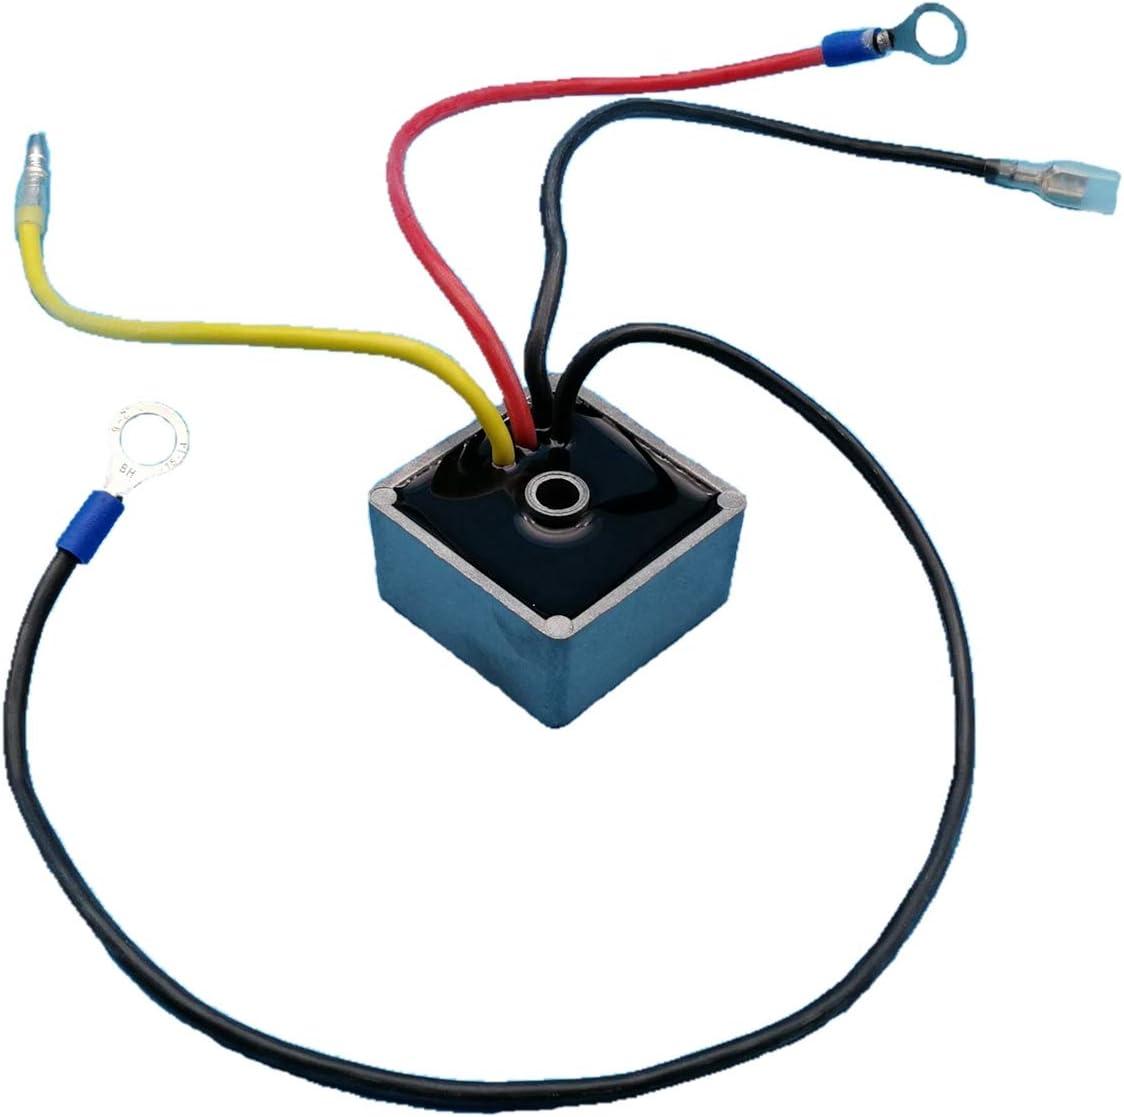 Amazon.com: Tuzliufi Voltage Regulator Rectifier for Club Car 1015777  102711201 Gas Golf Carts Karts 1992 & Up DS Models 4 Wires 1027101-01  1015777 - EPIGC113 14.5V New Z114: AutomotiveAmazon.com